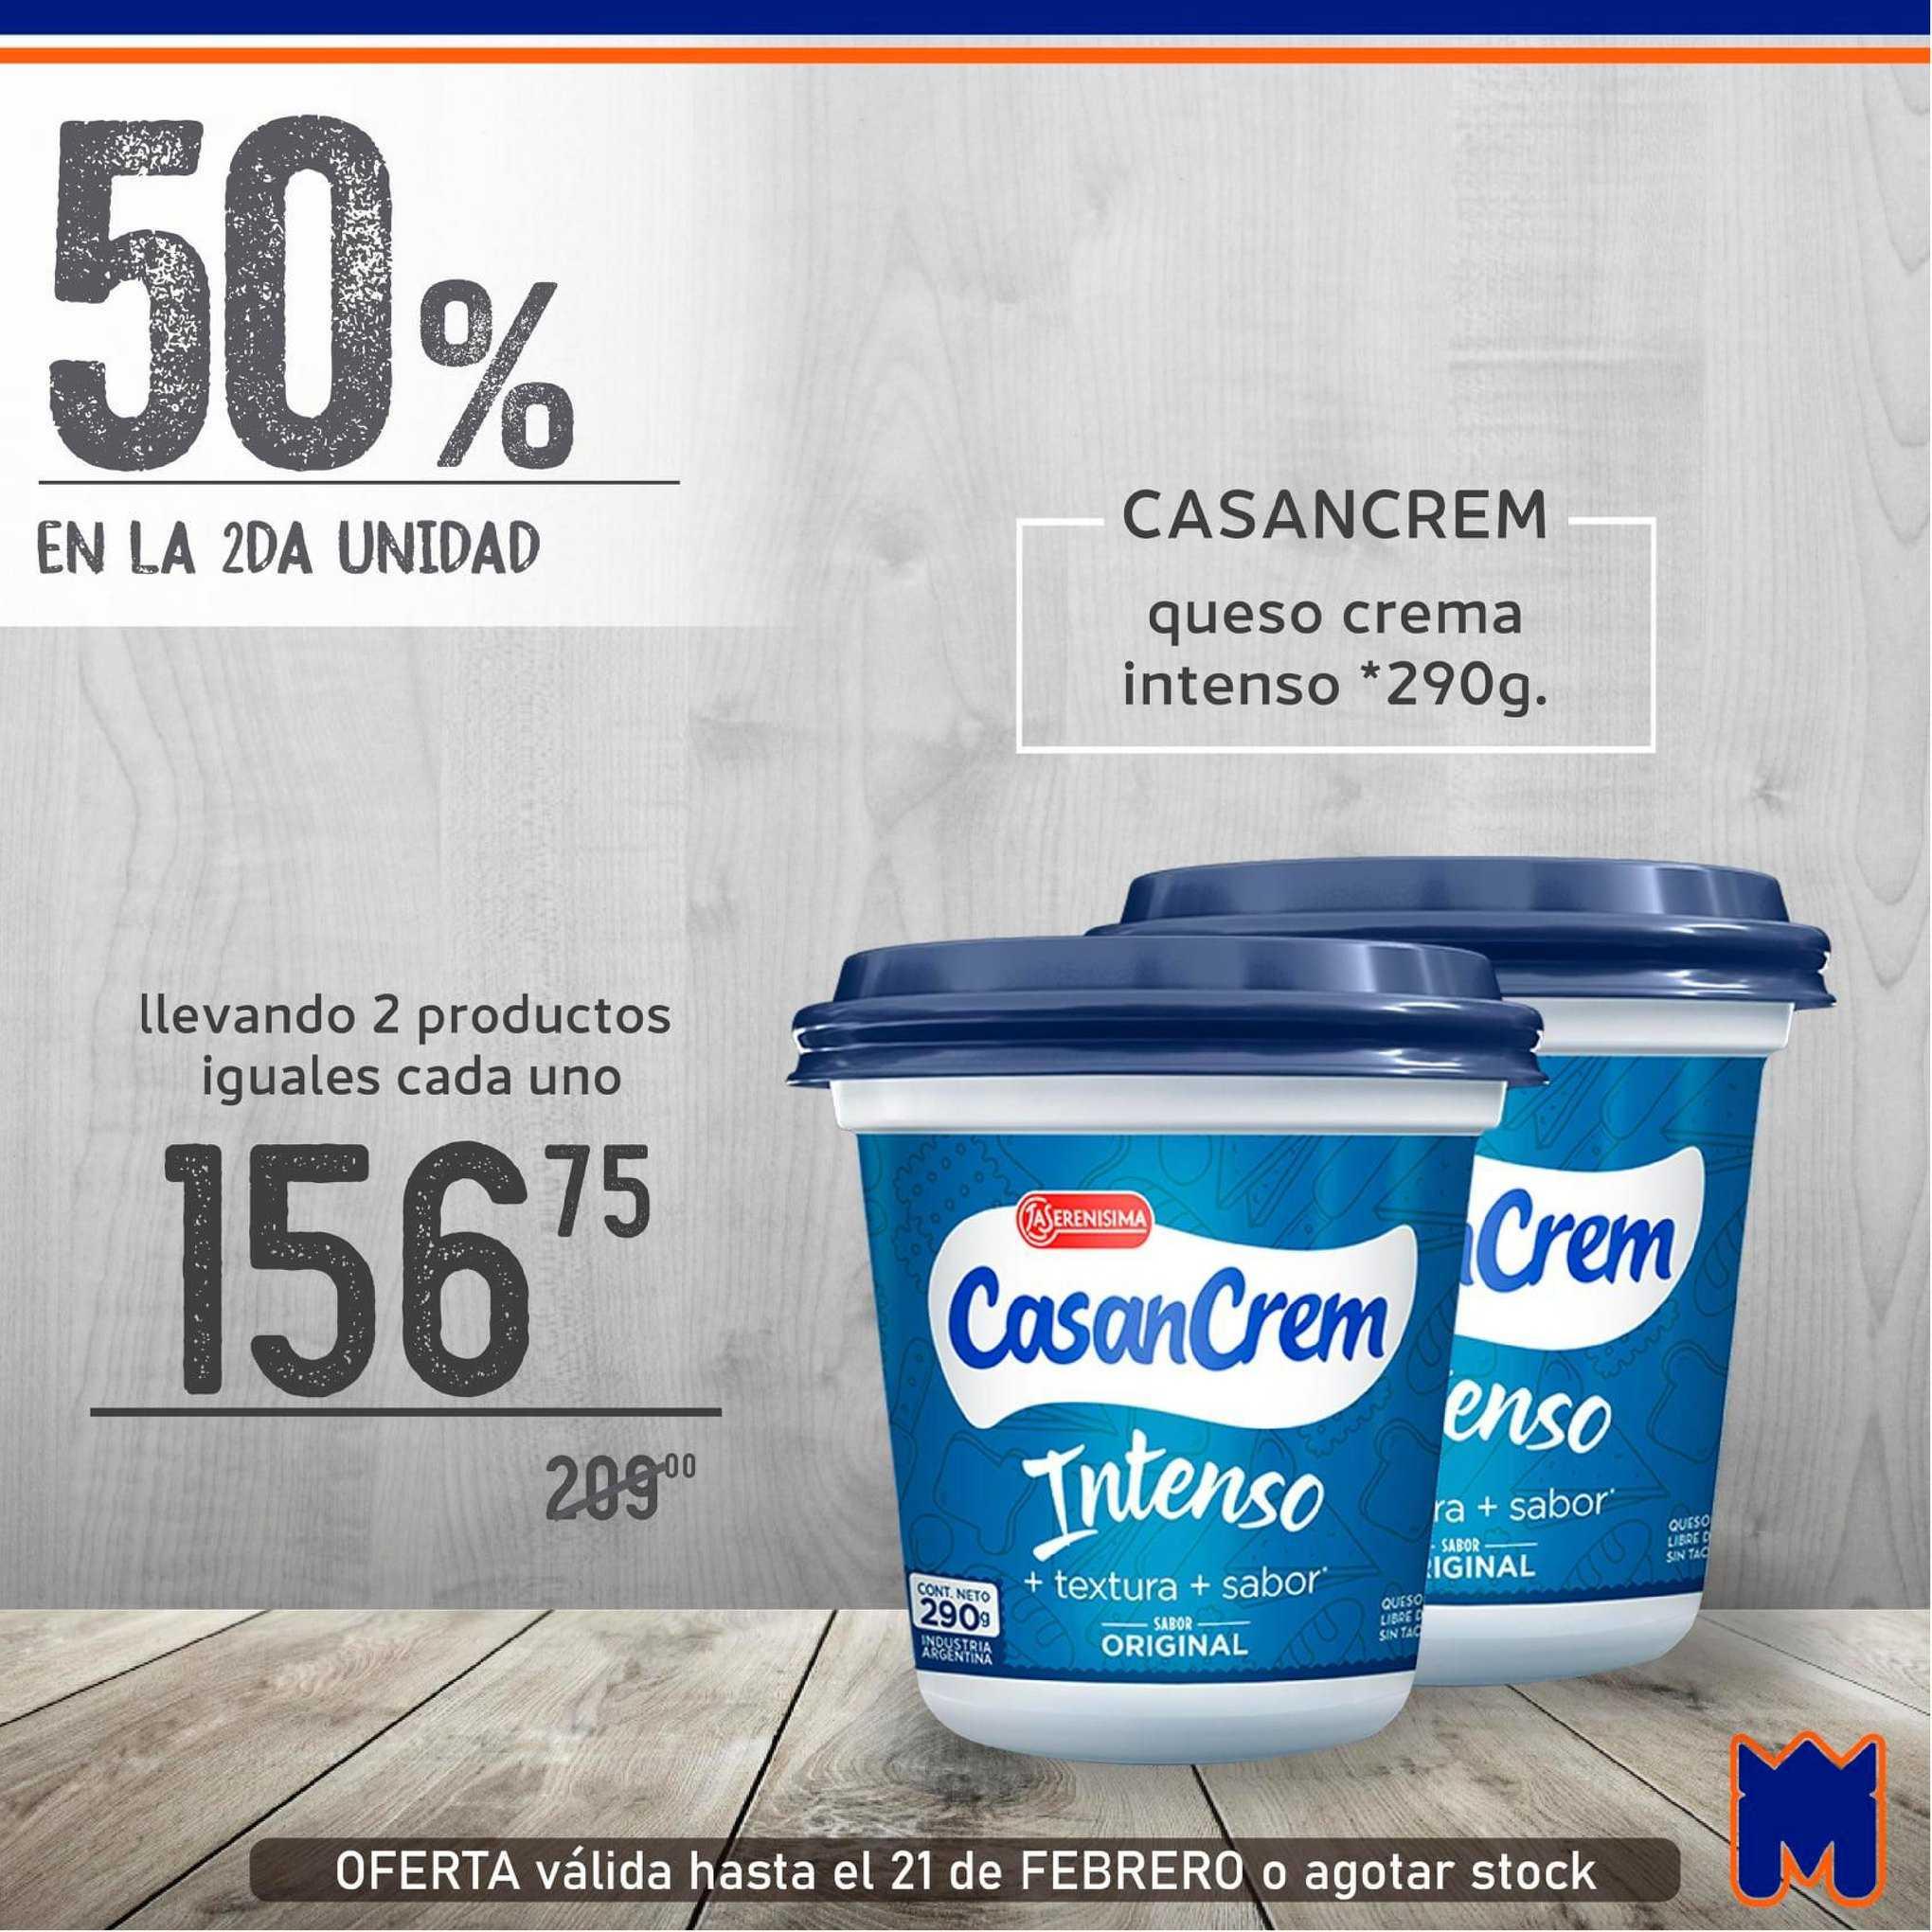 Supermercados Monarca Casancrem Queso Crema Intenso